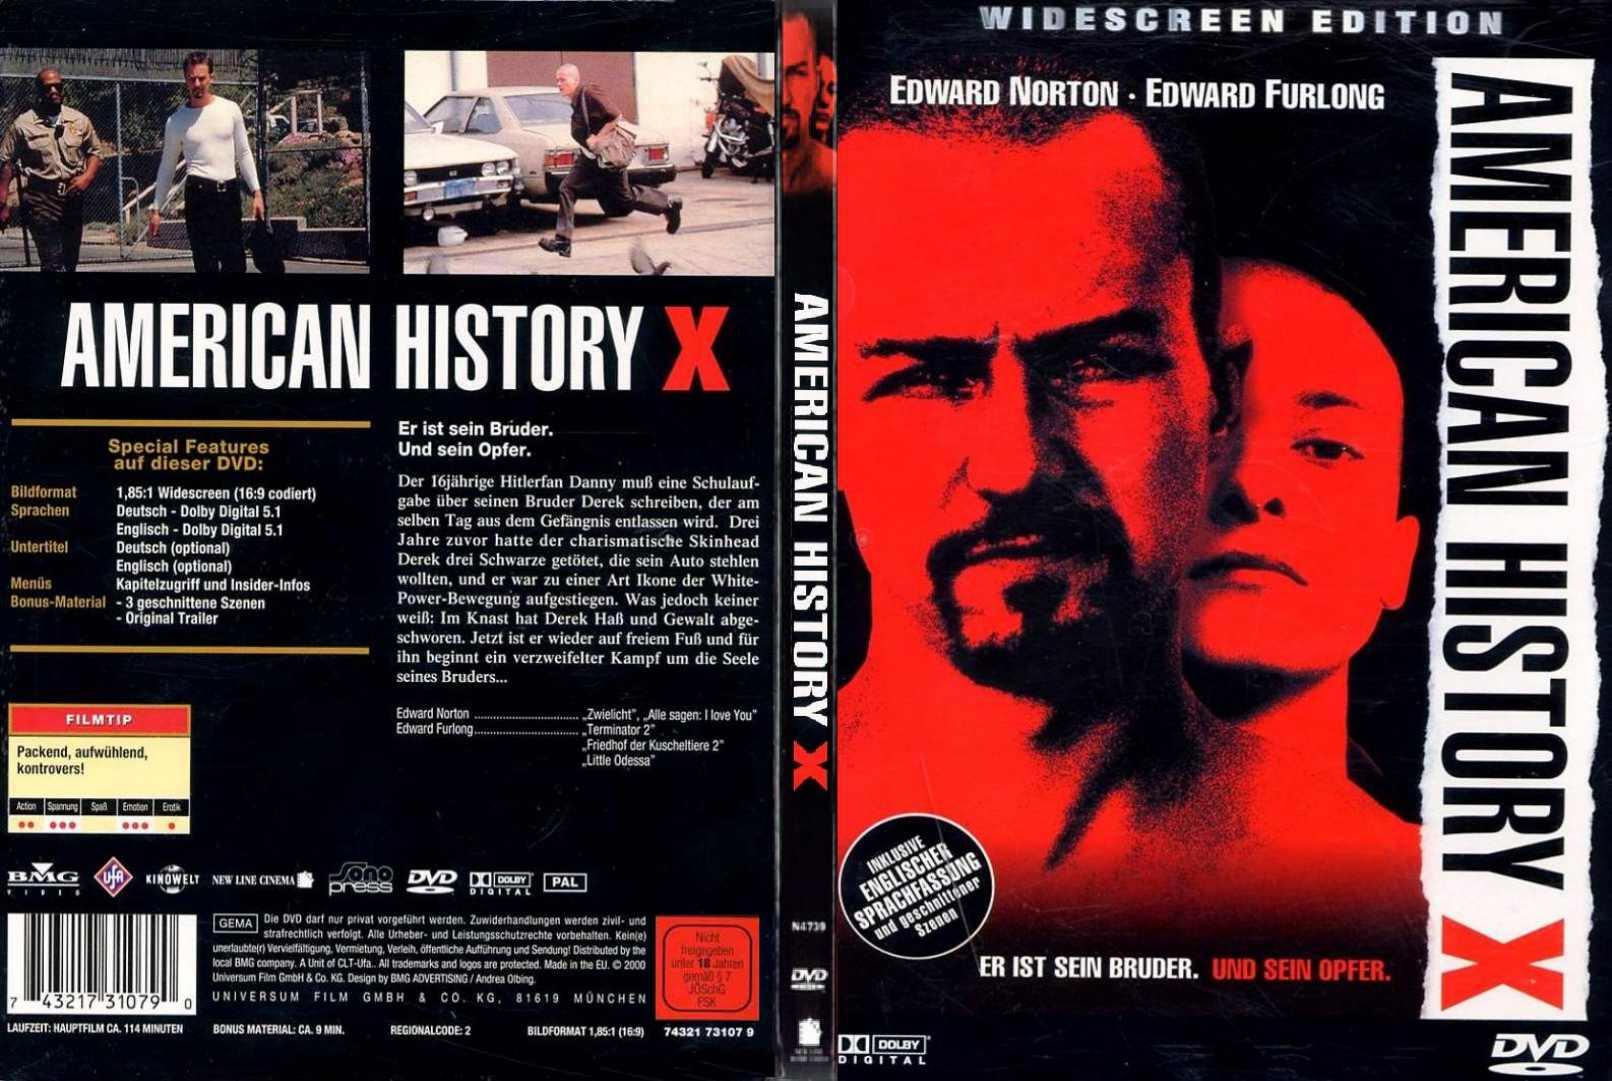 American History X (1988)